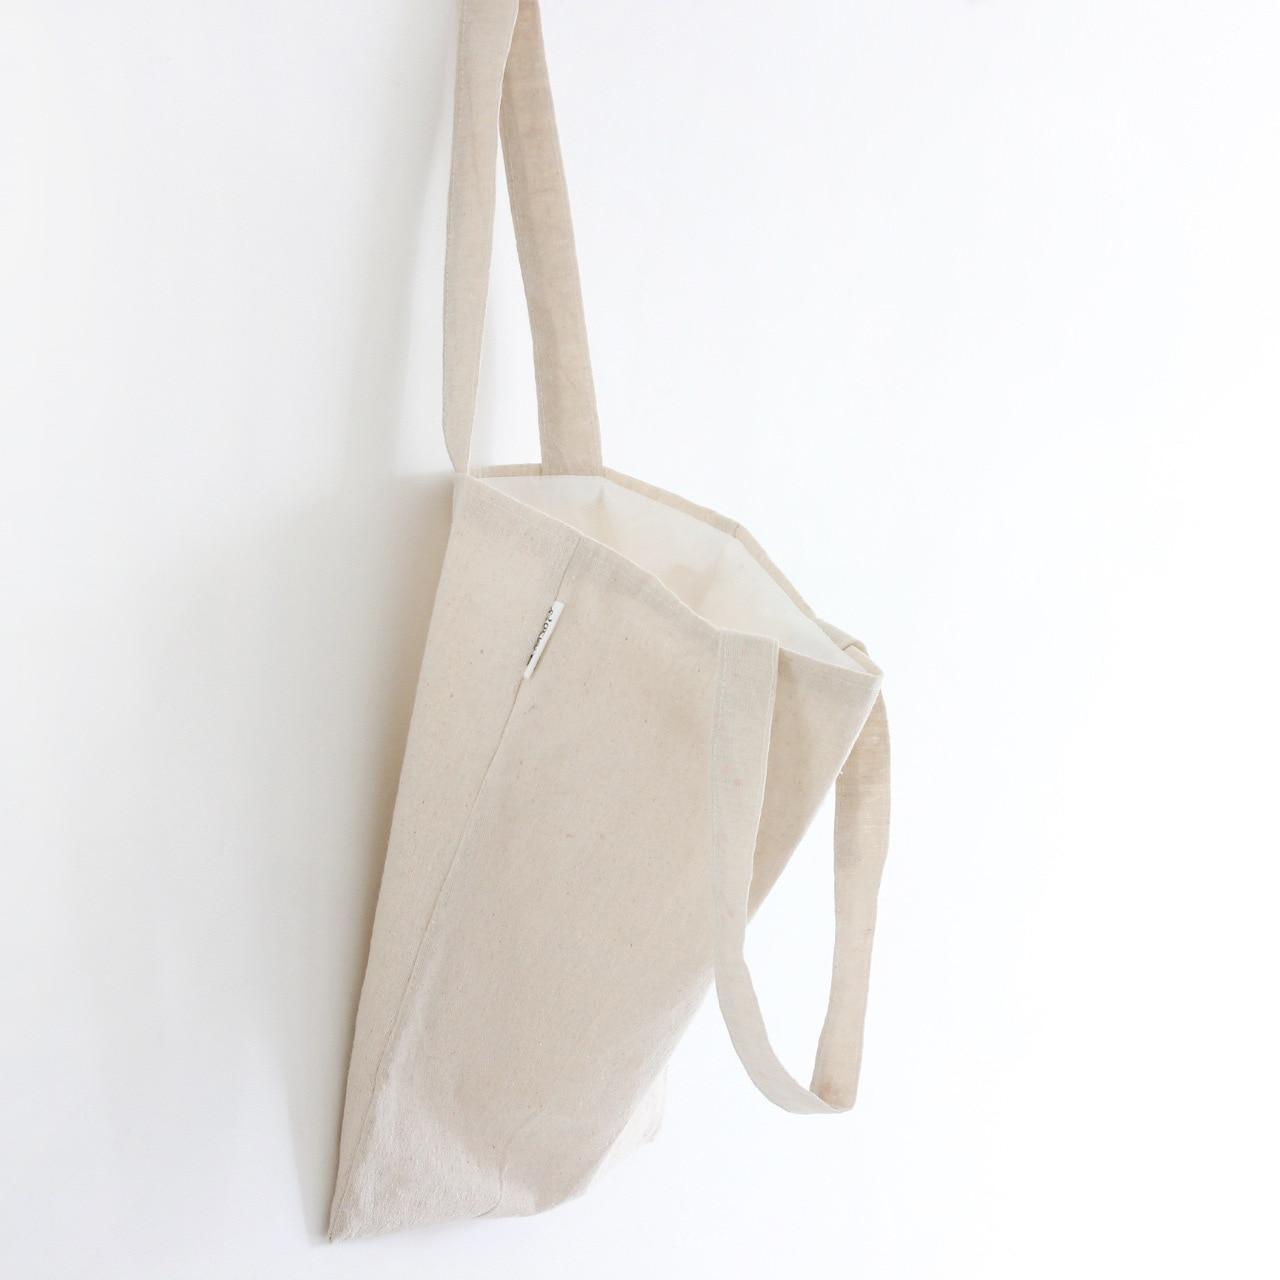 Online Get Cheap Plain Cotton Tote Bag -Aliexpress.com | Alibaba Group